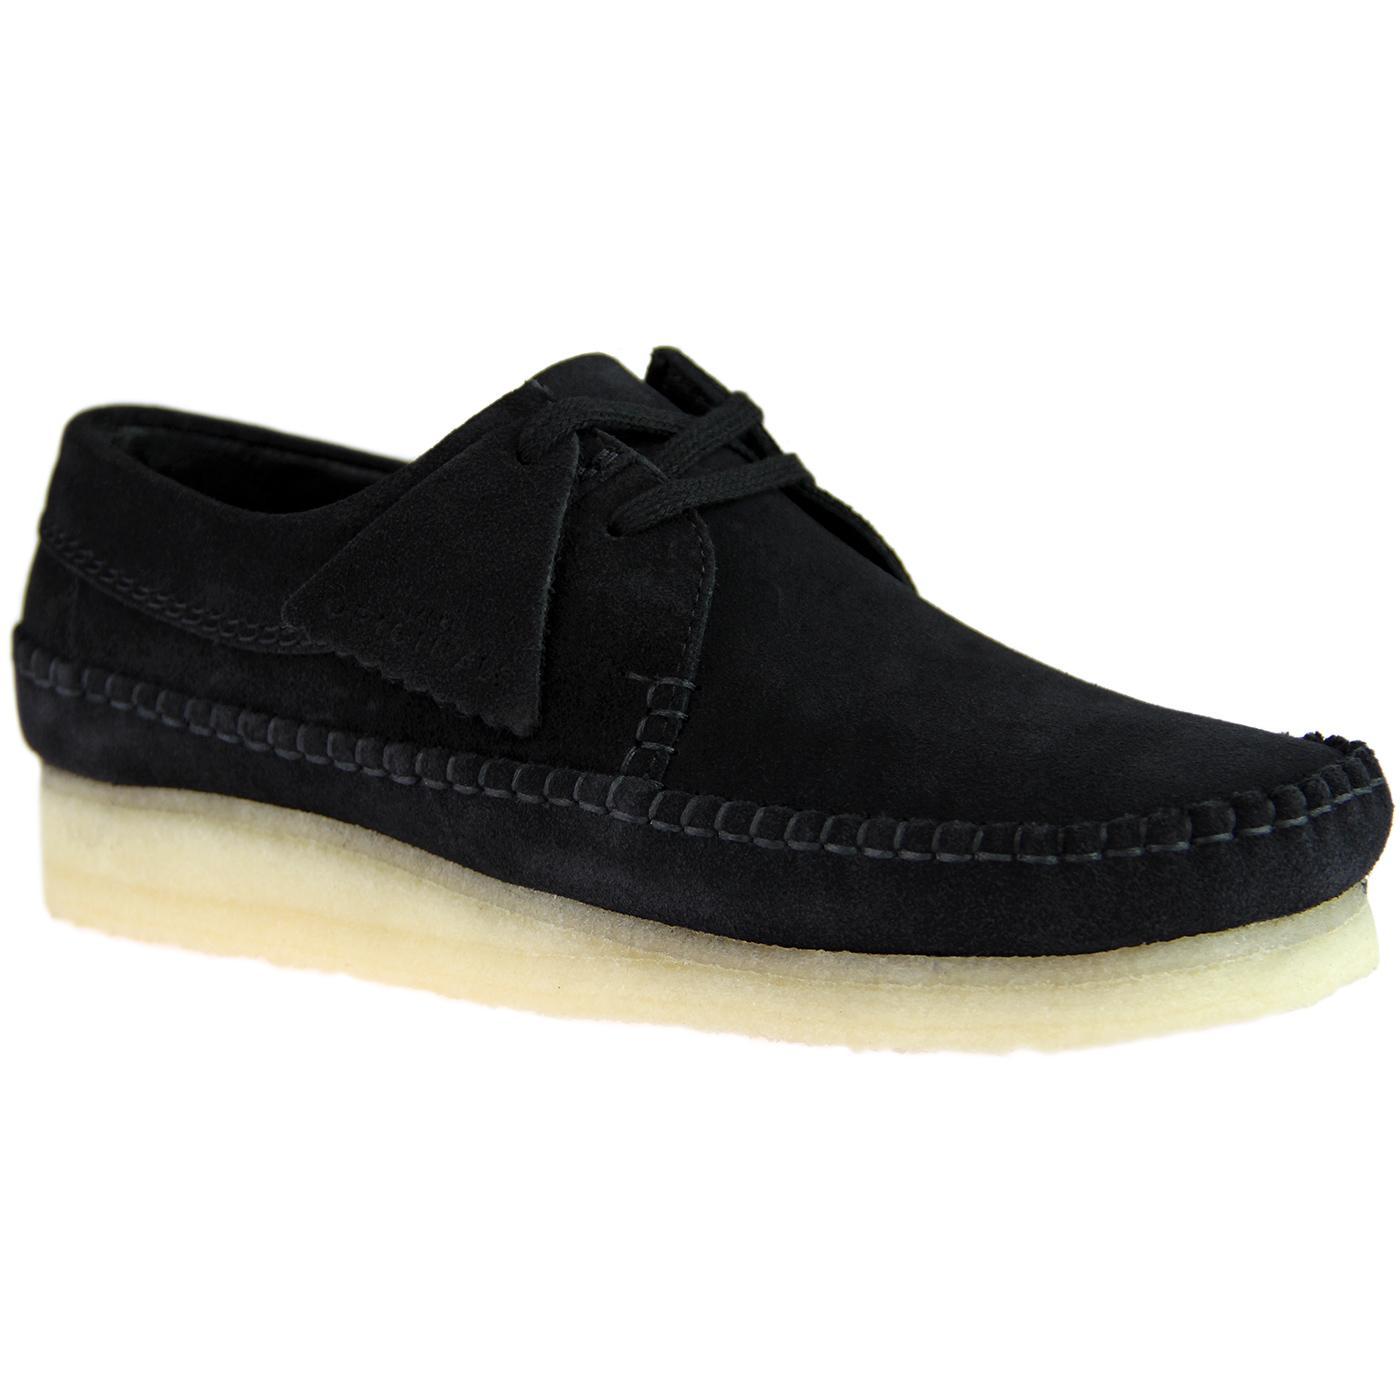 Weaver CLARKS ORIGINALS Suede Moccasin Shoes BLACK